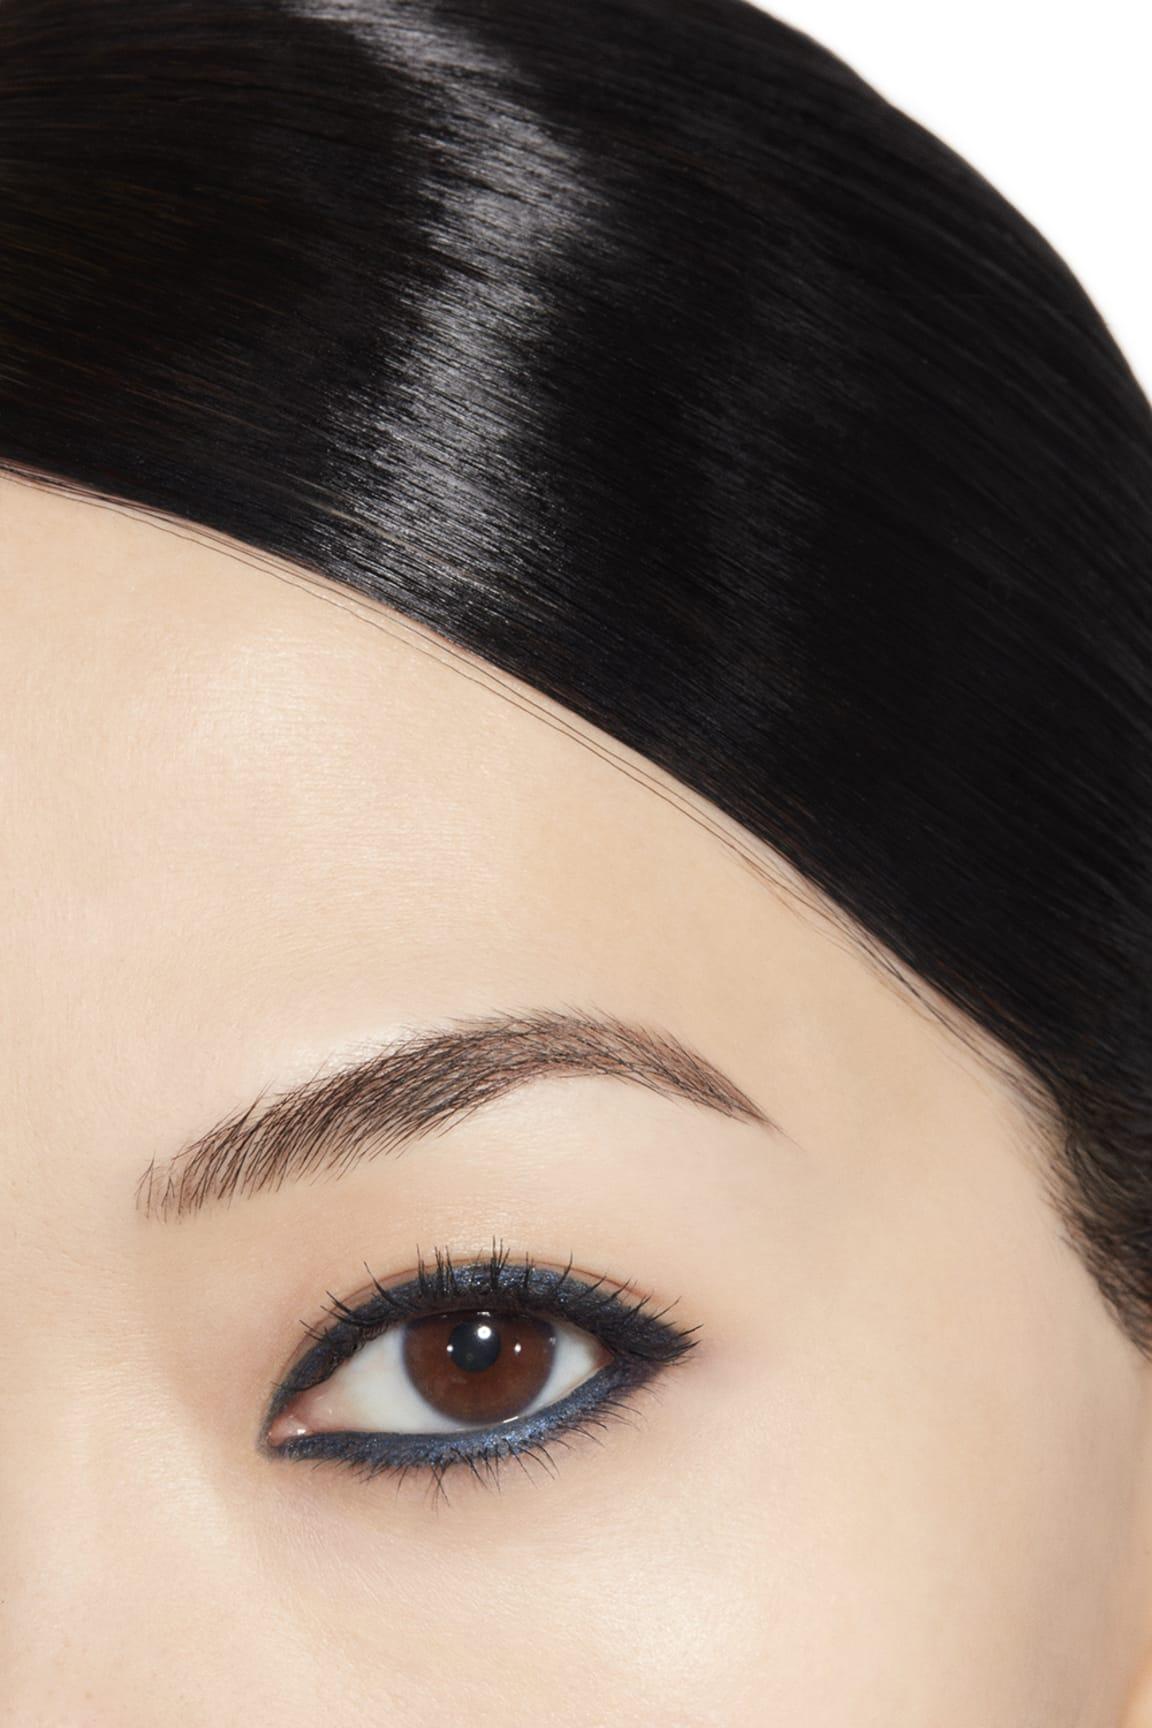 Anwendung Make-up-Bild 1 - STYLO YEUX WATERPROOF 30 - MARINE